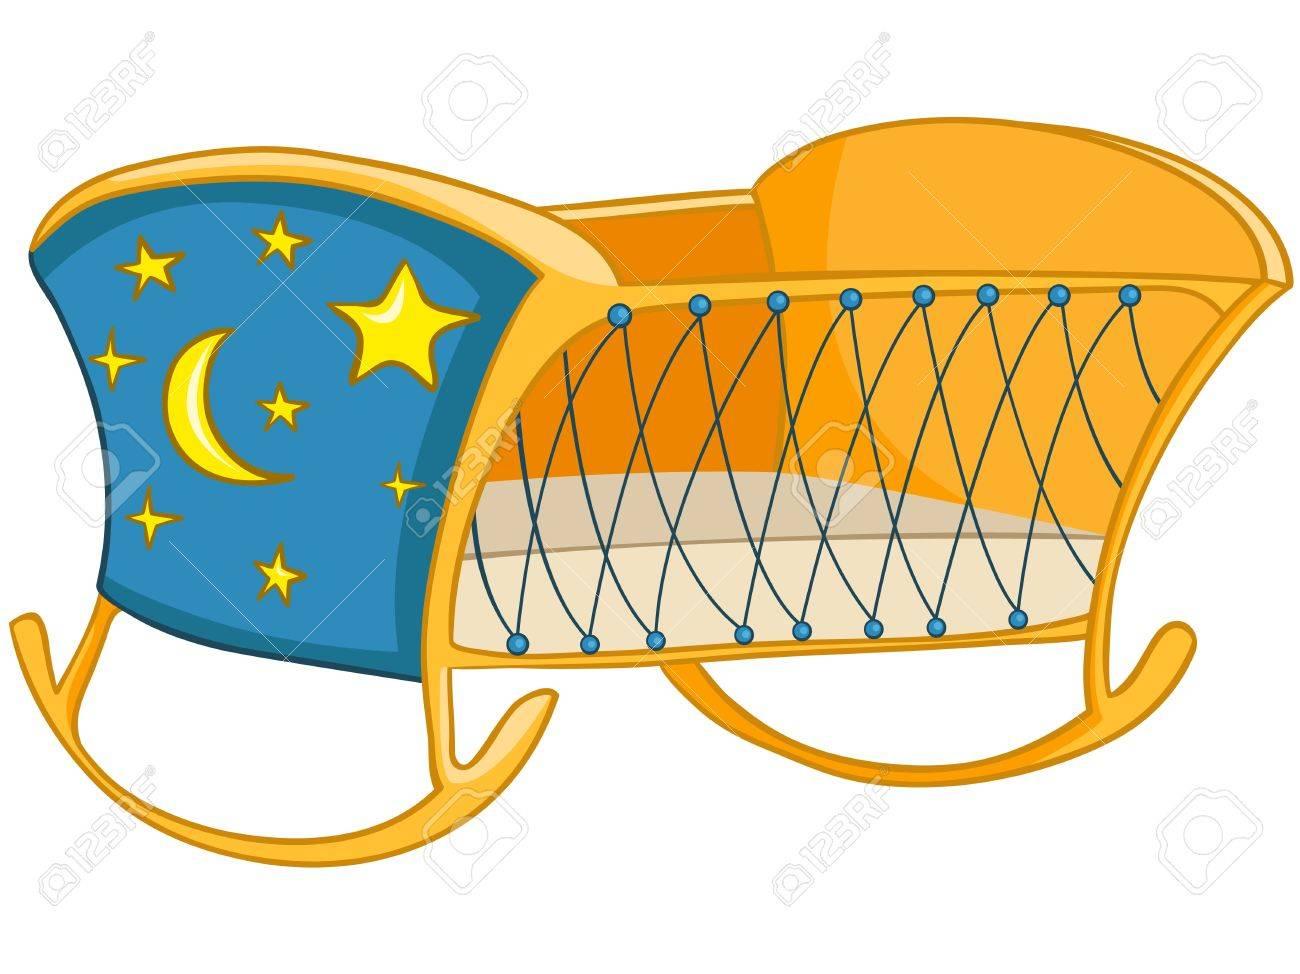 bedroom furniture clipart. cartoon home furniture bed stock vector - 12372168 bedroom clipart